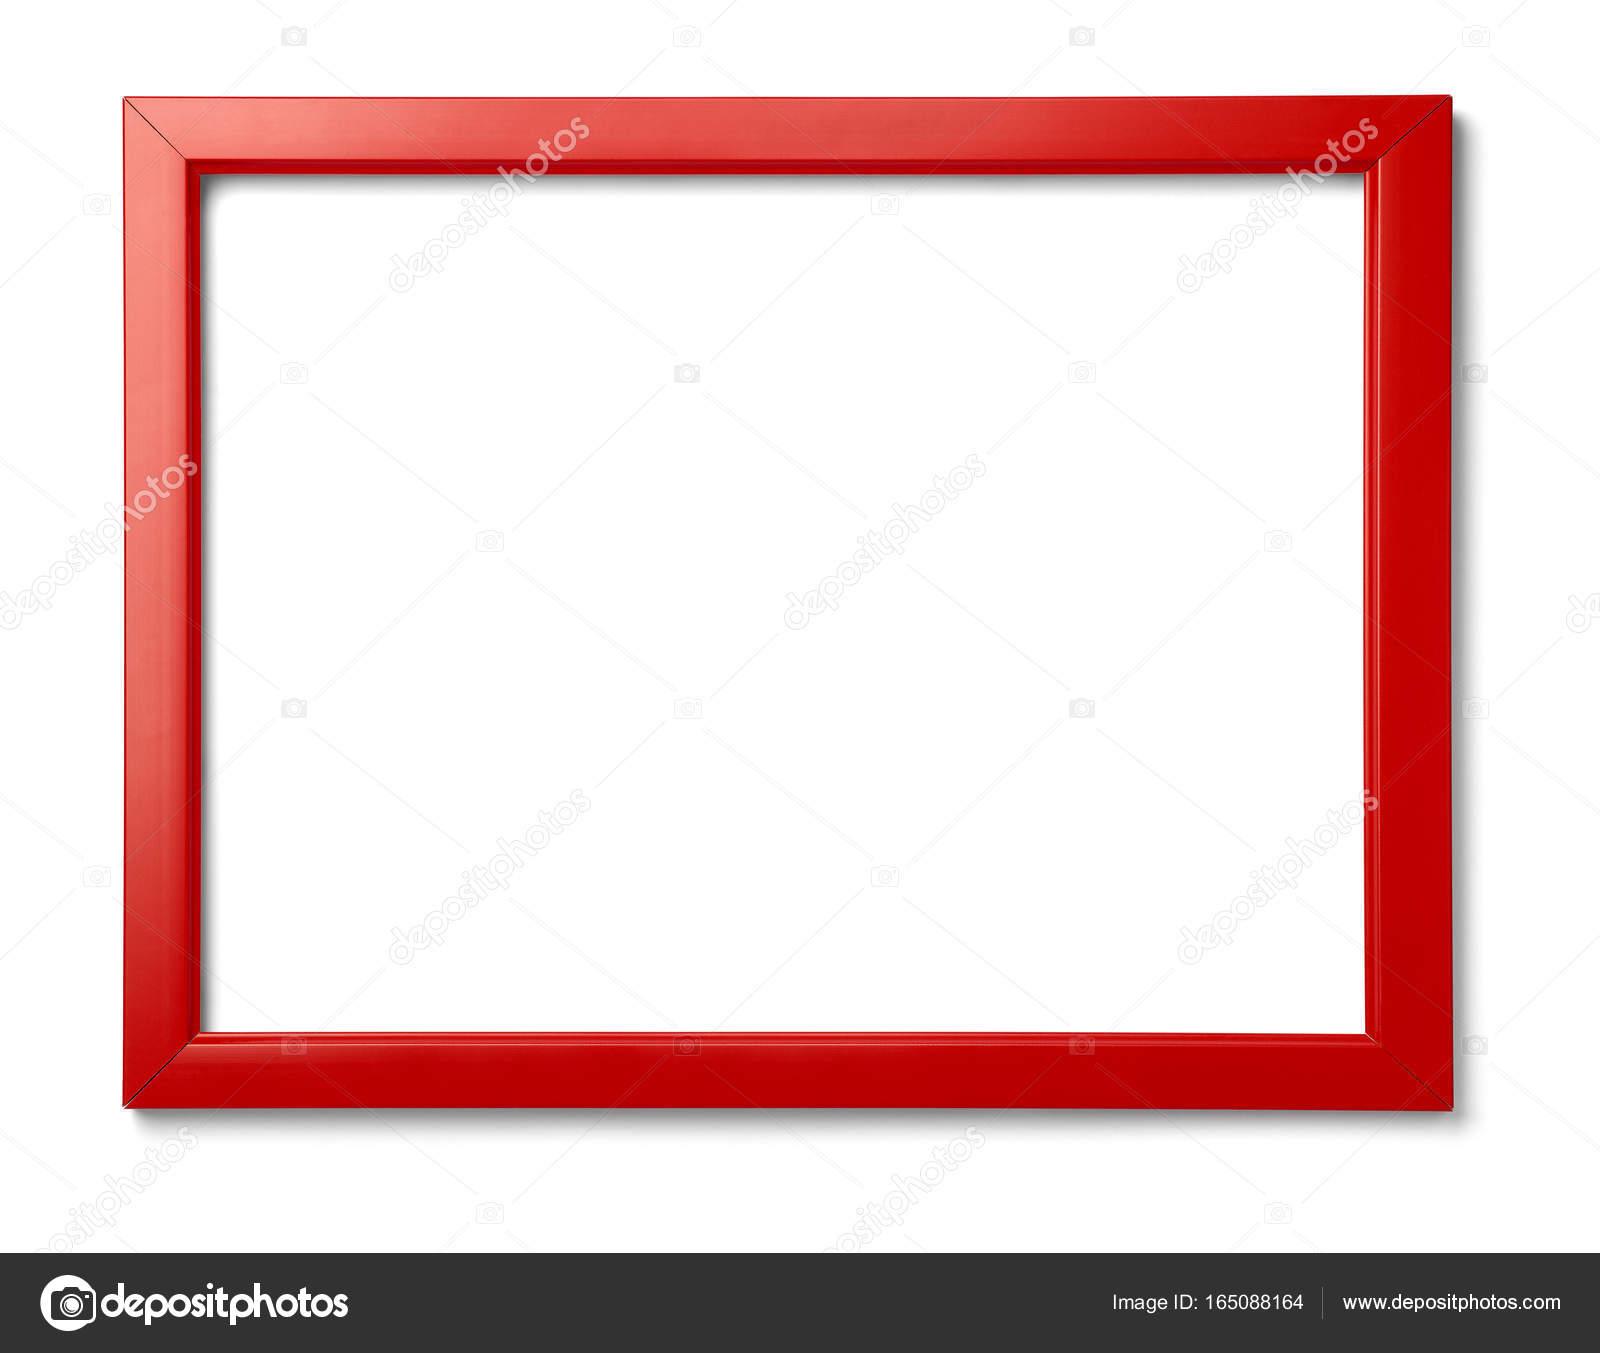 Vintage-Rahmen Holz Hintergrundbild — Stockfoto © PicsFive #165088164